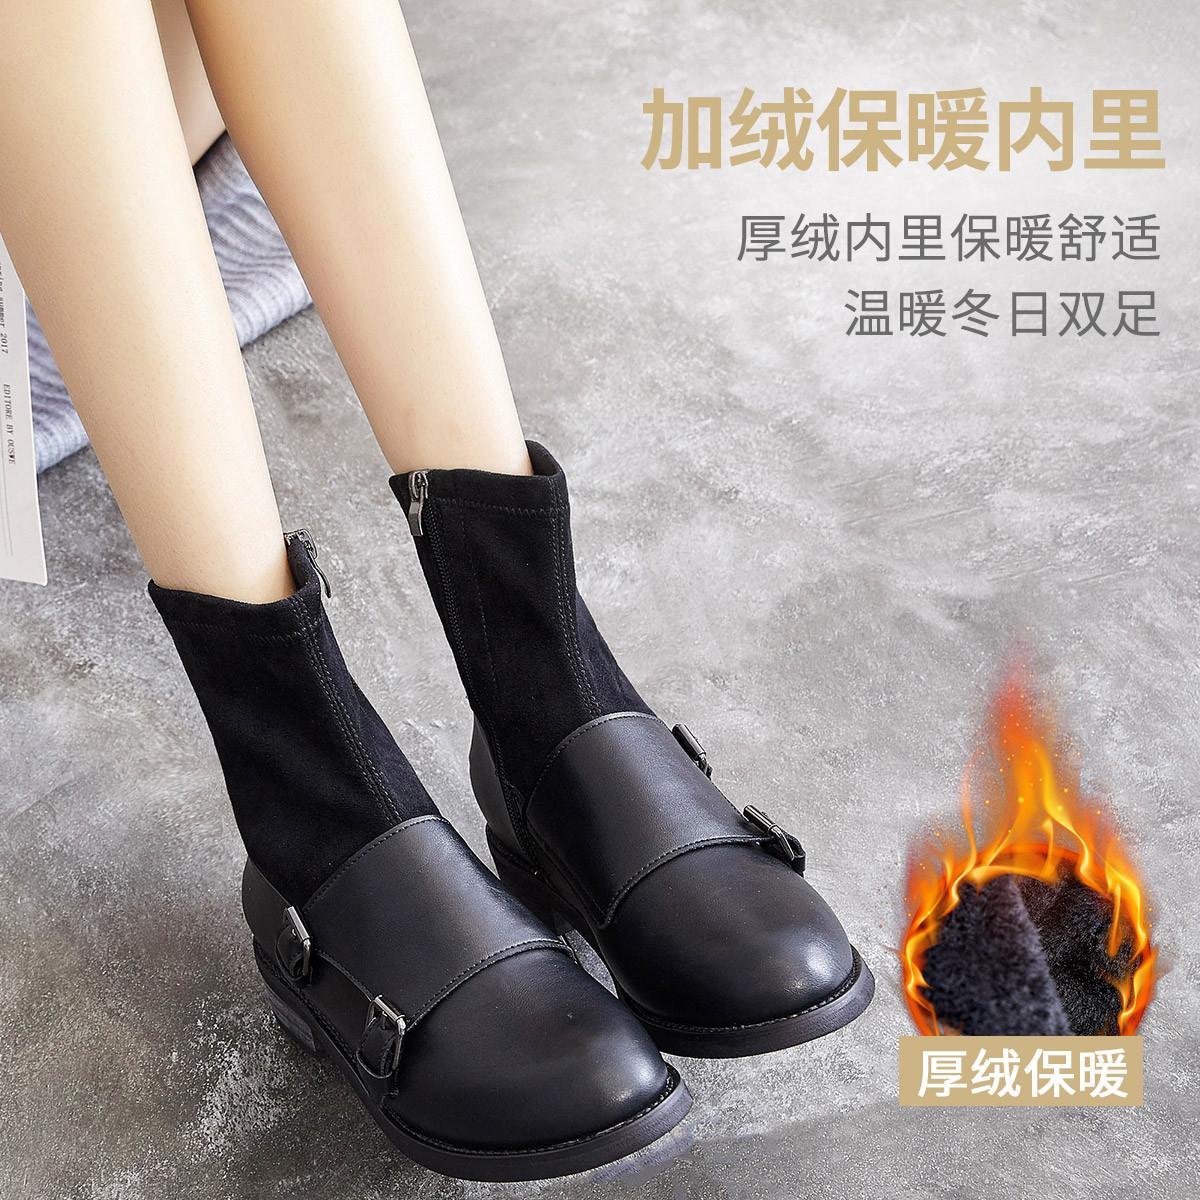 IAIZO雪地靴女2019冬新款短靴拼接加绒女鞋英伦风切尔西女靴拉链休闲鞋78102220247